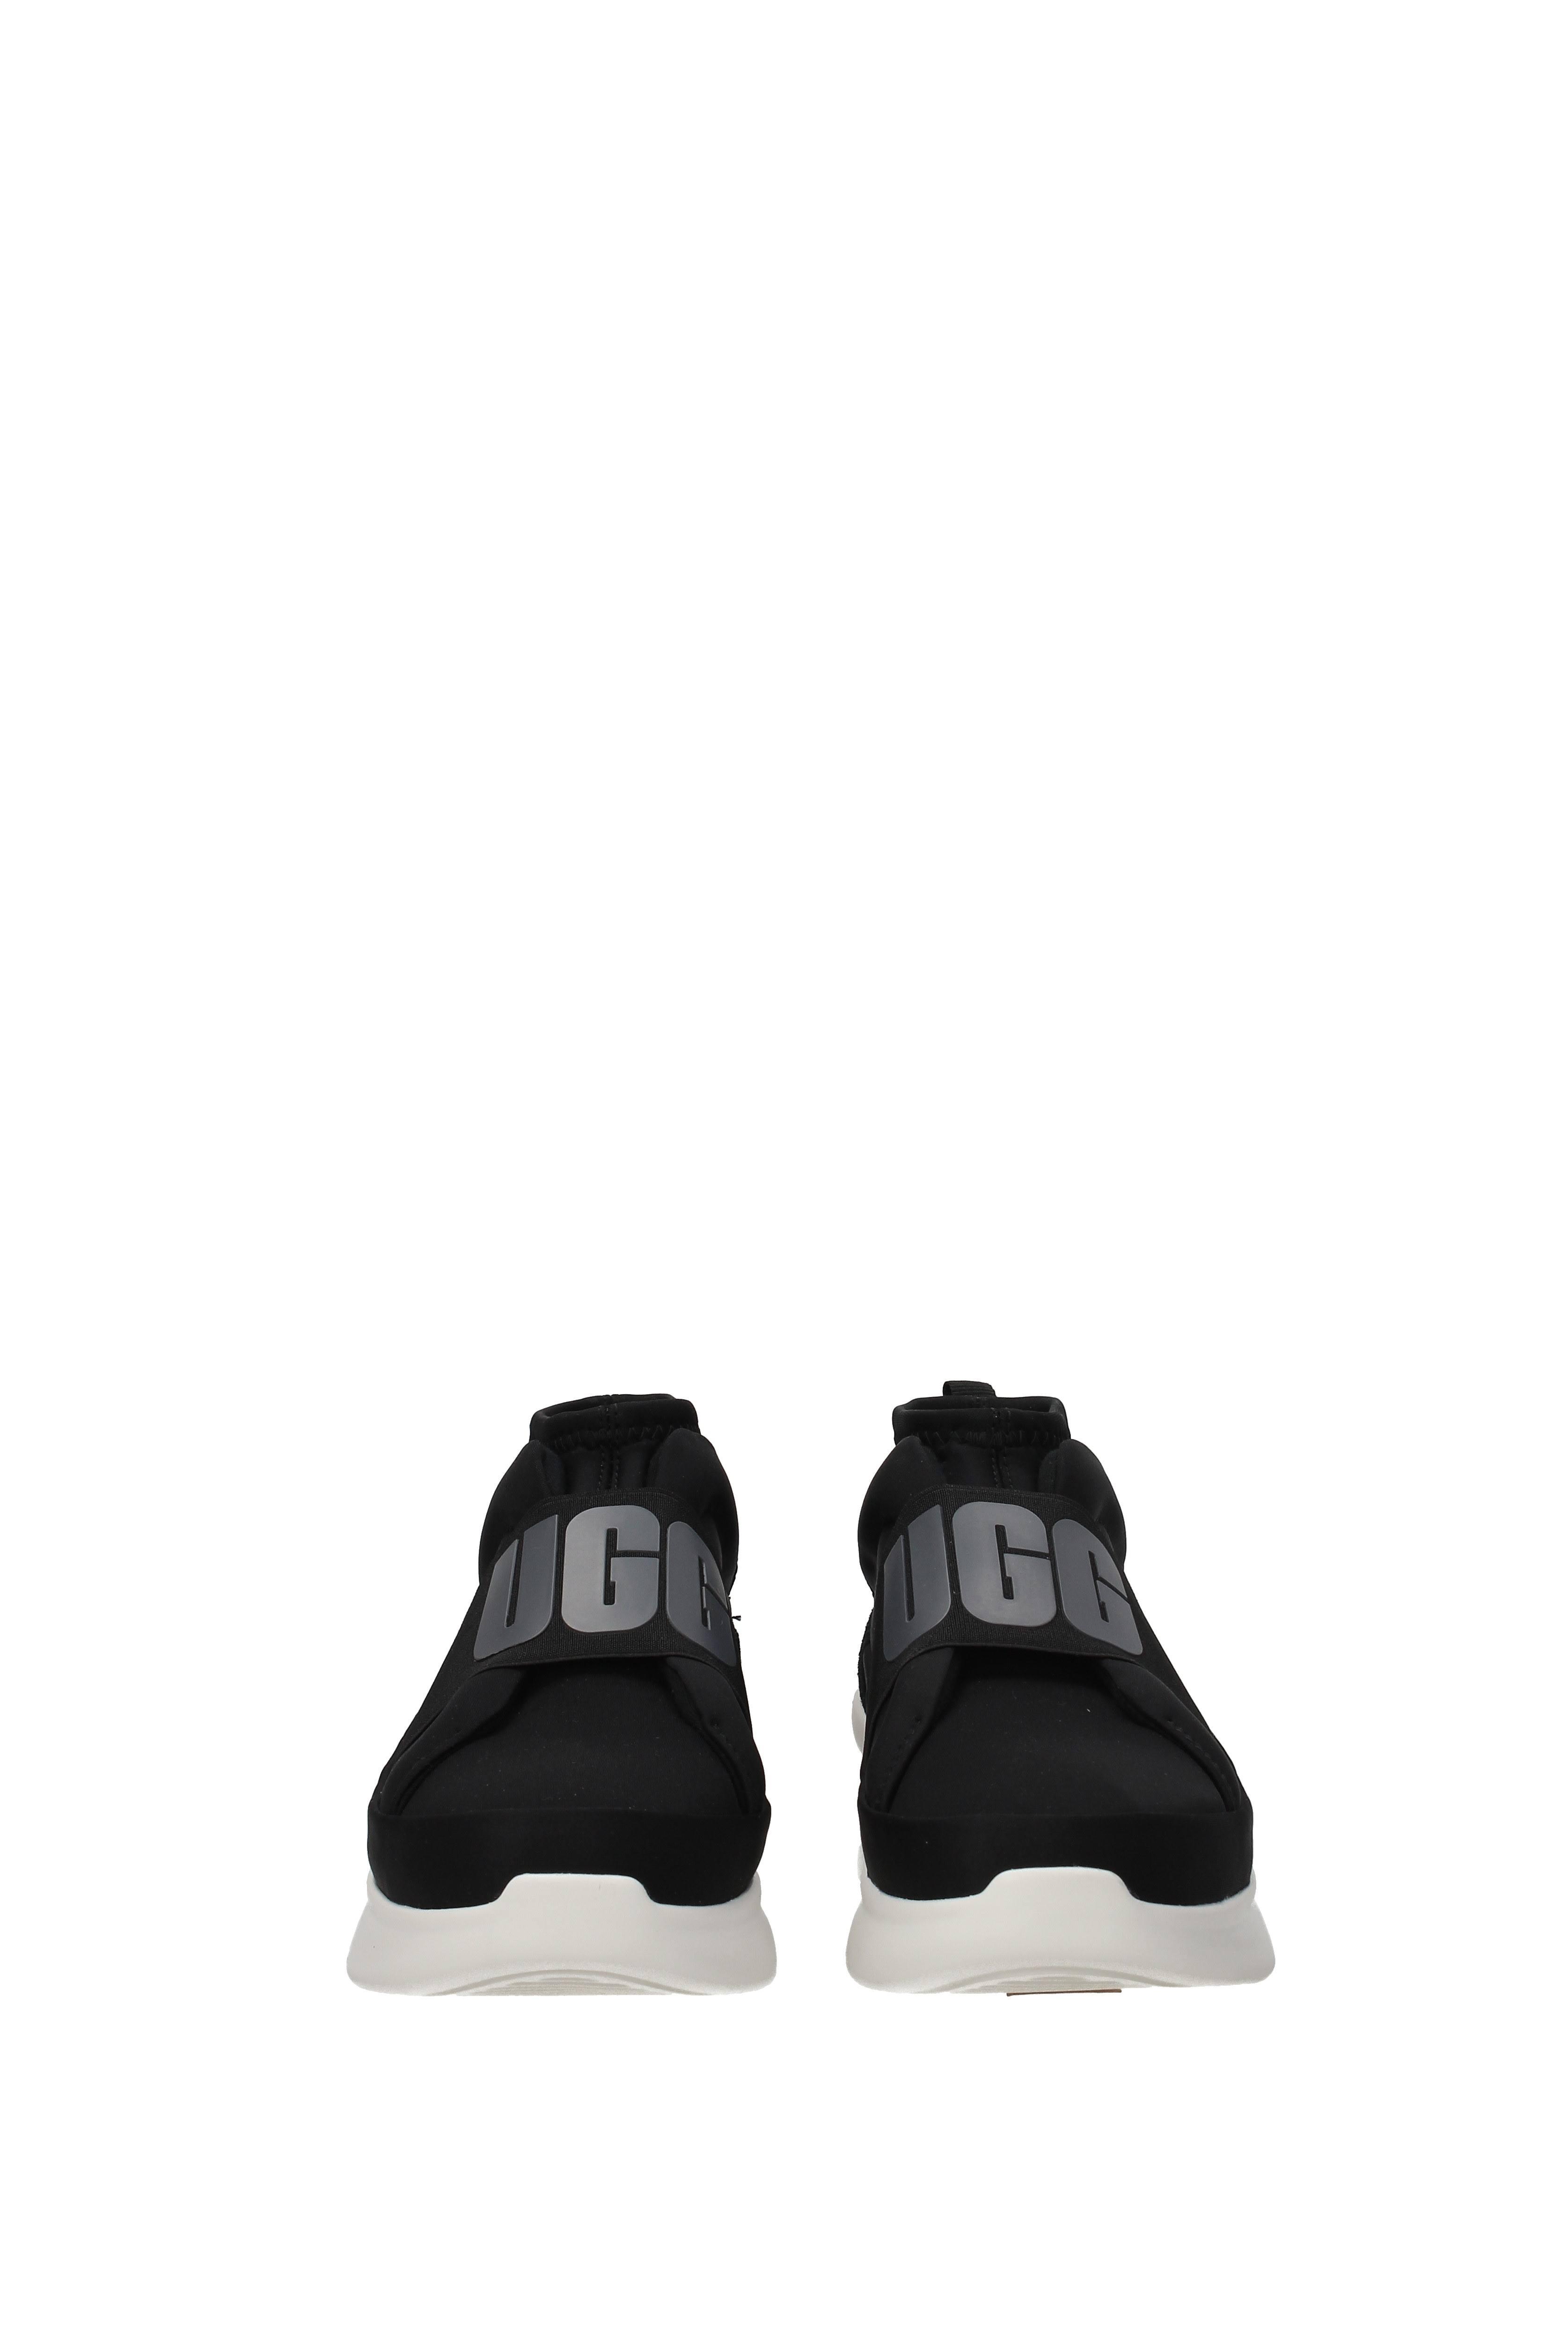 Ugg Women's Neutra Ugg Women's Ugg Sneaker Black Neutra Black Sneaker EBawSCSxnq